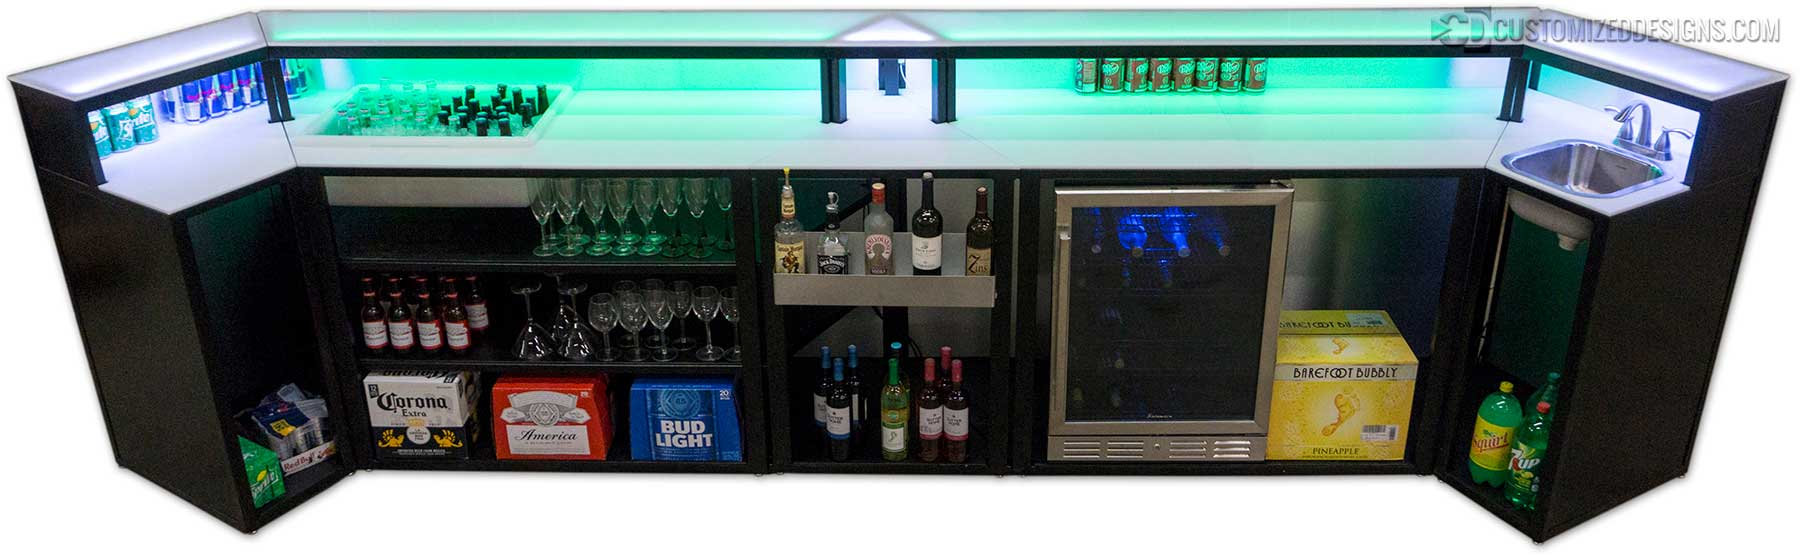 Custom Commercial Bar